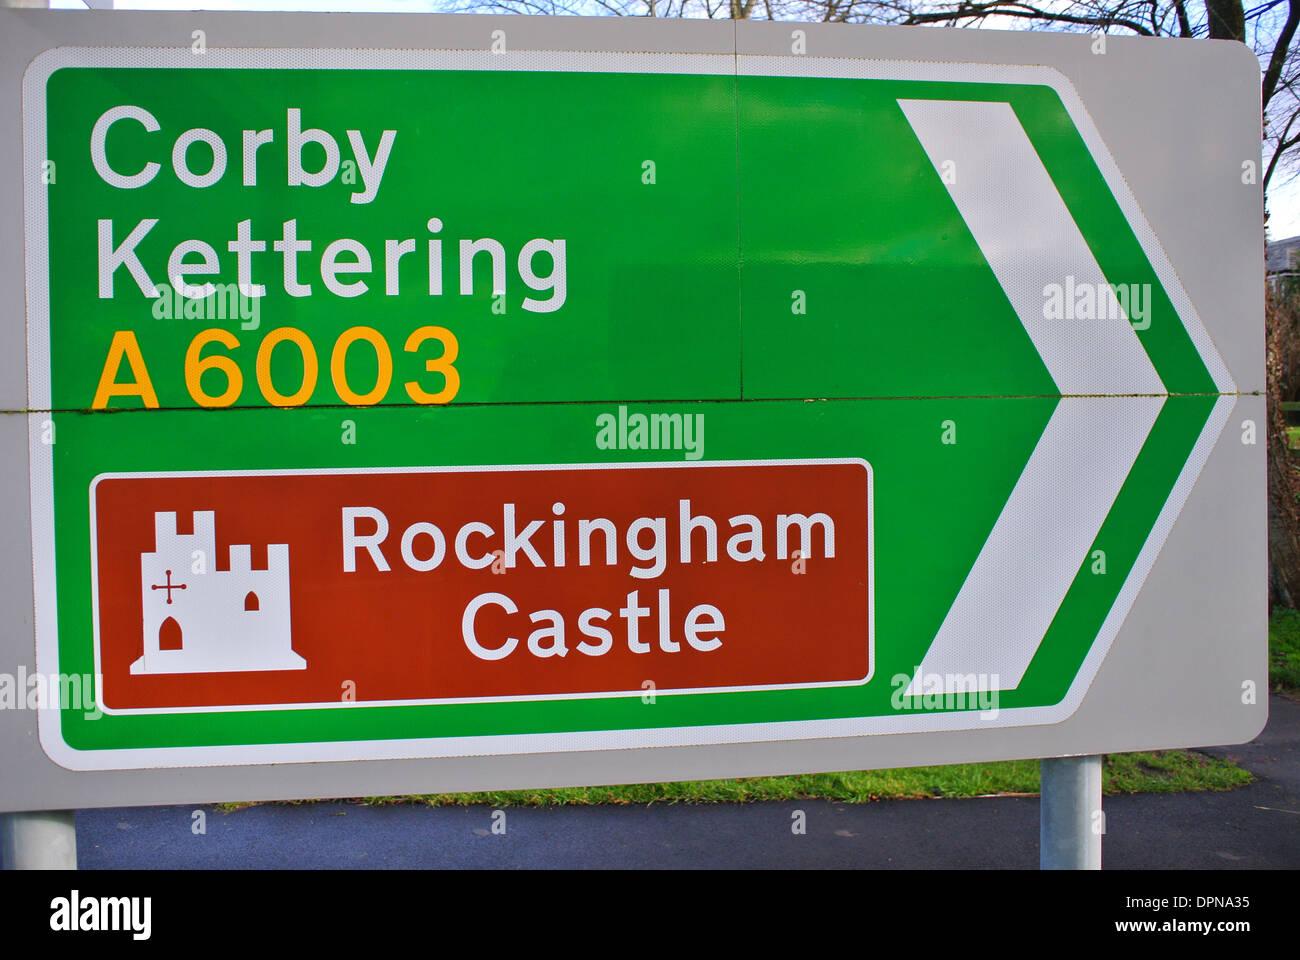 Corby Kettering street sign Rockingham Castle - Stock Image